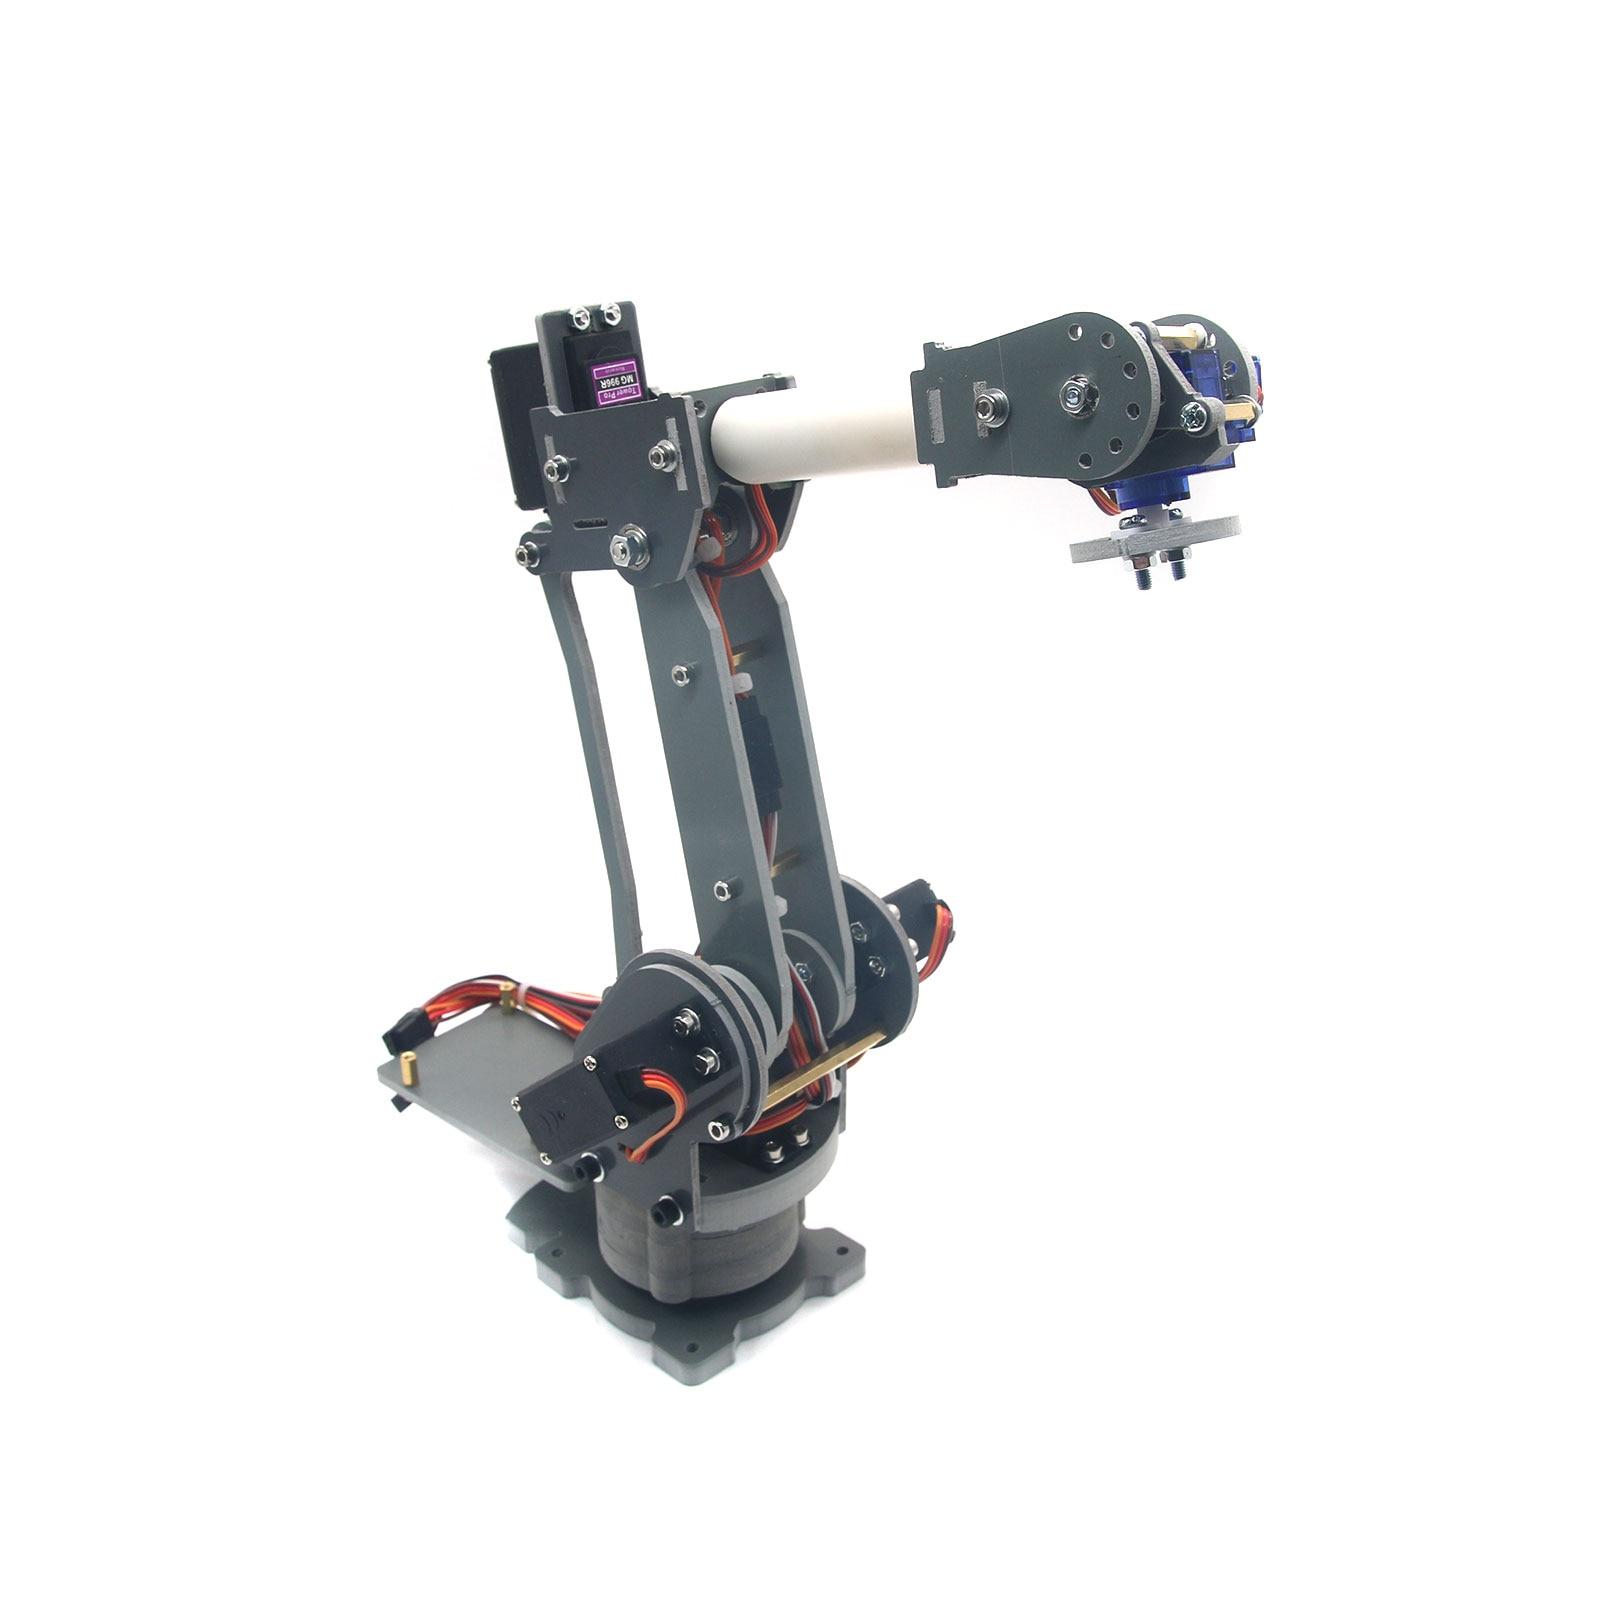 ABB 6DOF Industrial Robot Mechanical Arm Alloy Robotics Arm Rack with Servos for Arduino Assembled official doit 6 dof robot arm vehicle mounted robot arm for smart sar robot servos bracket mechanical manipulator aluminum